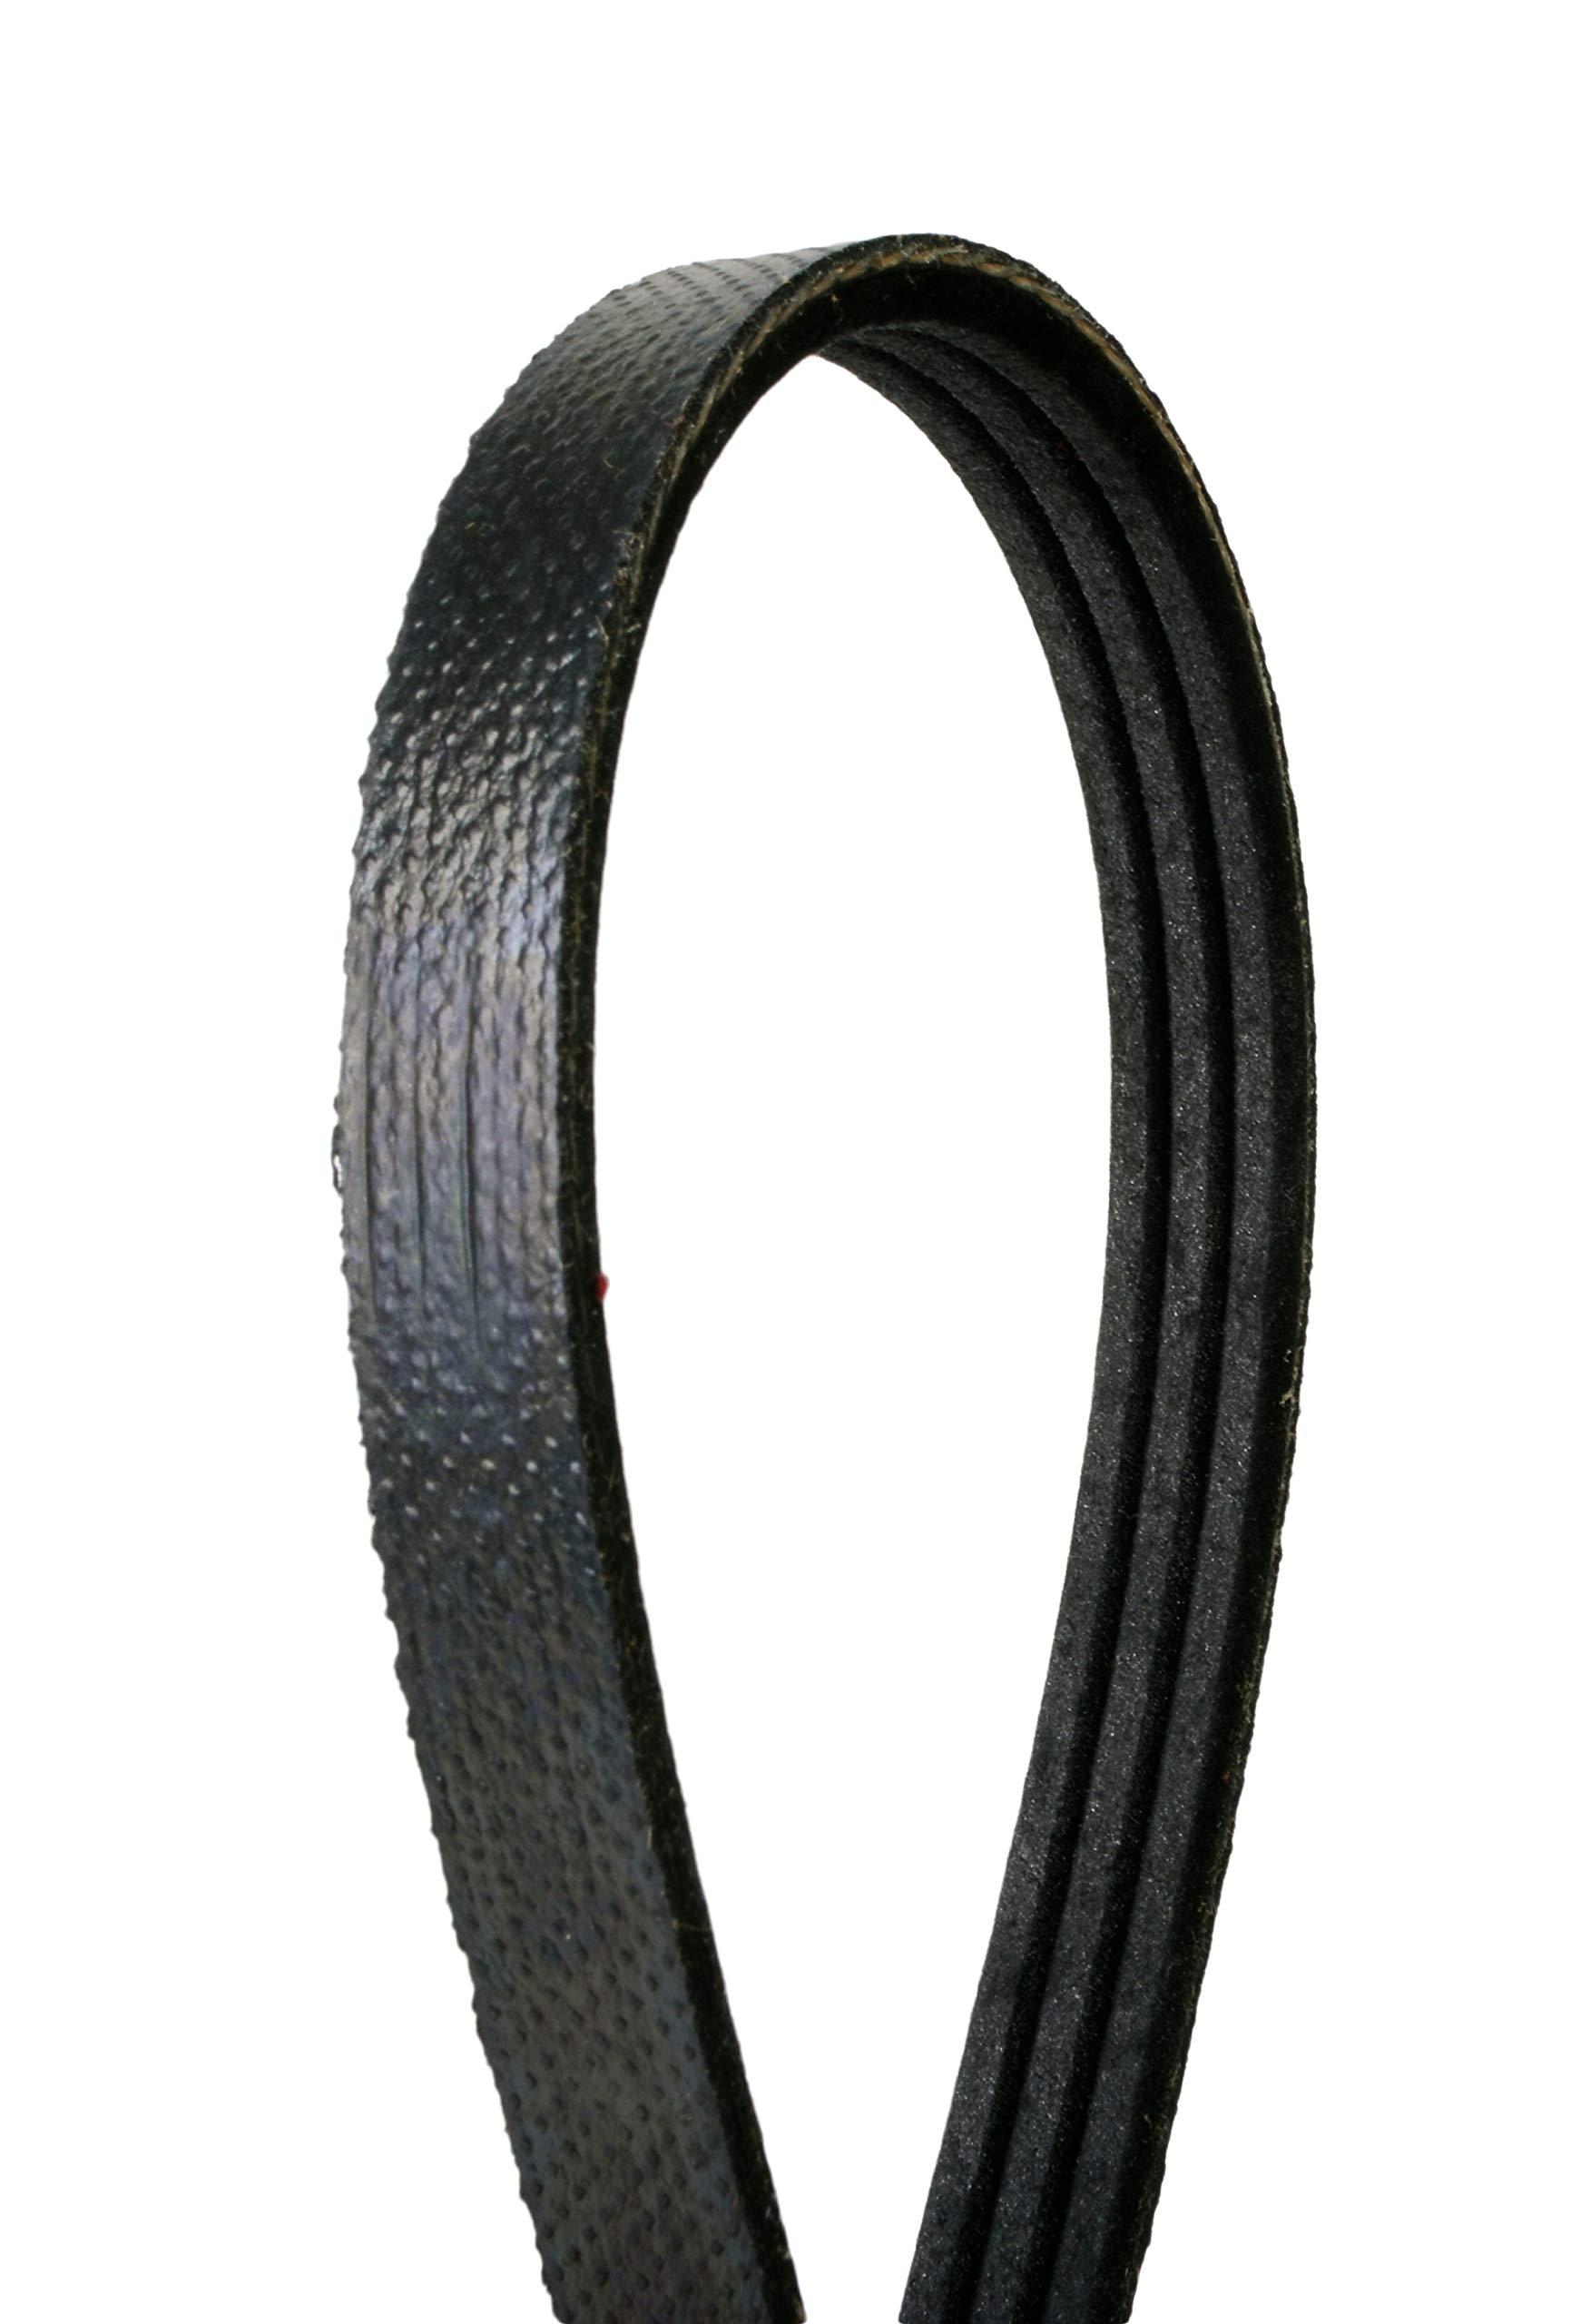 Continental 4040355 4-rib 35.5 Multi-V//Serpentine belt